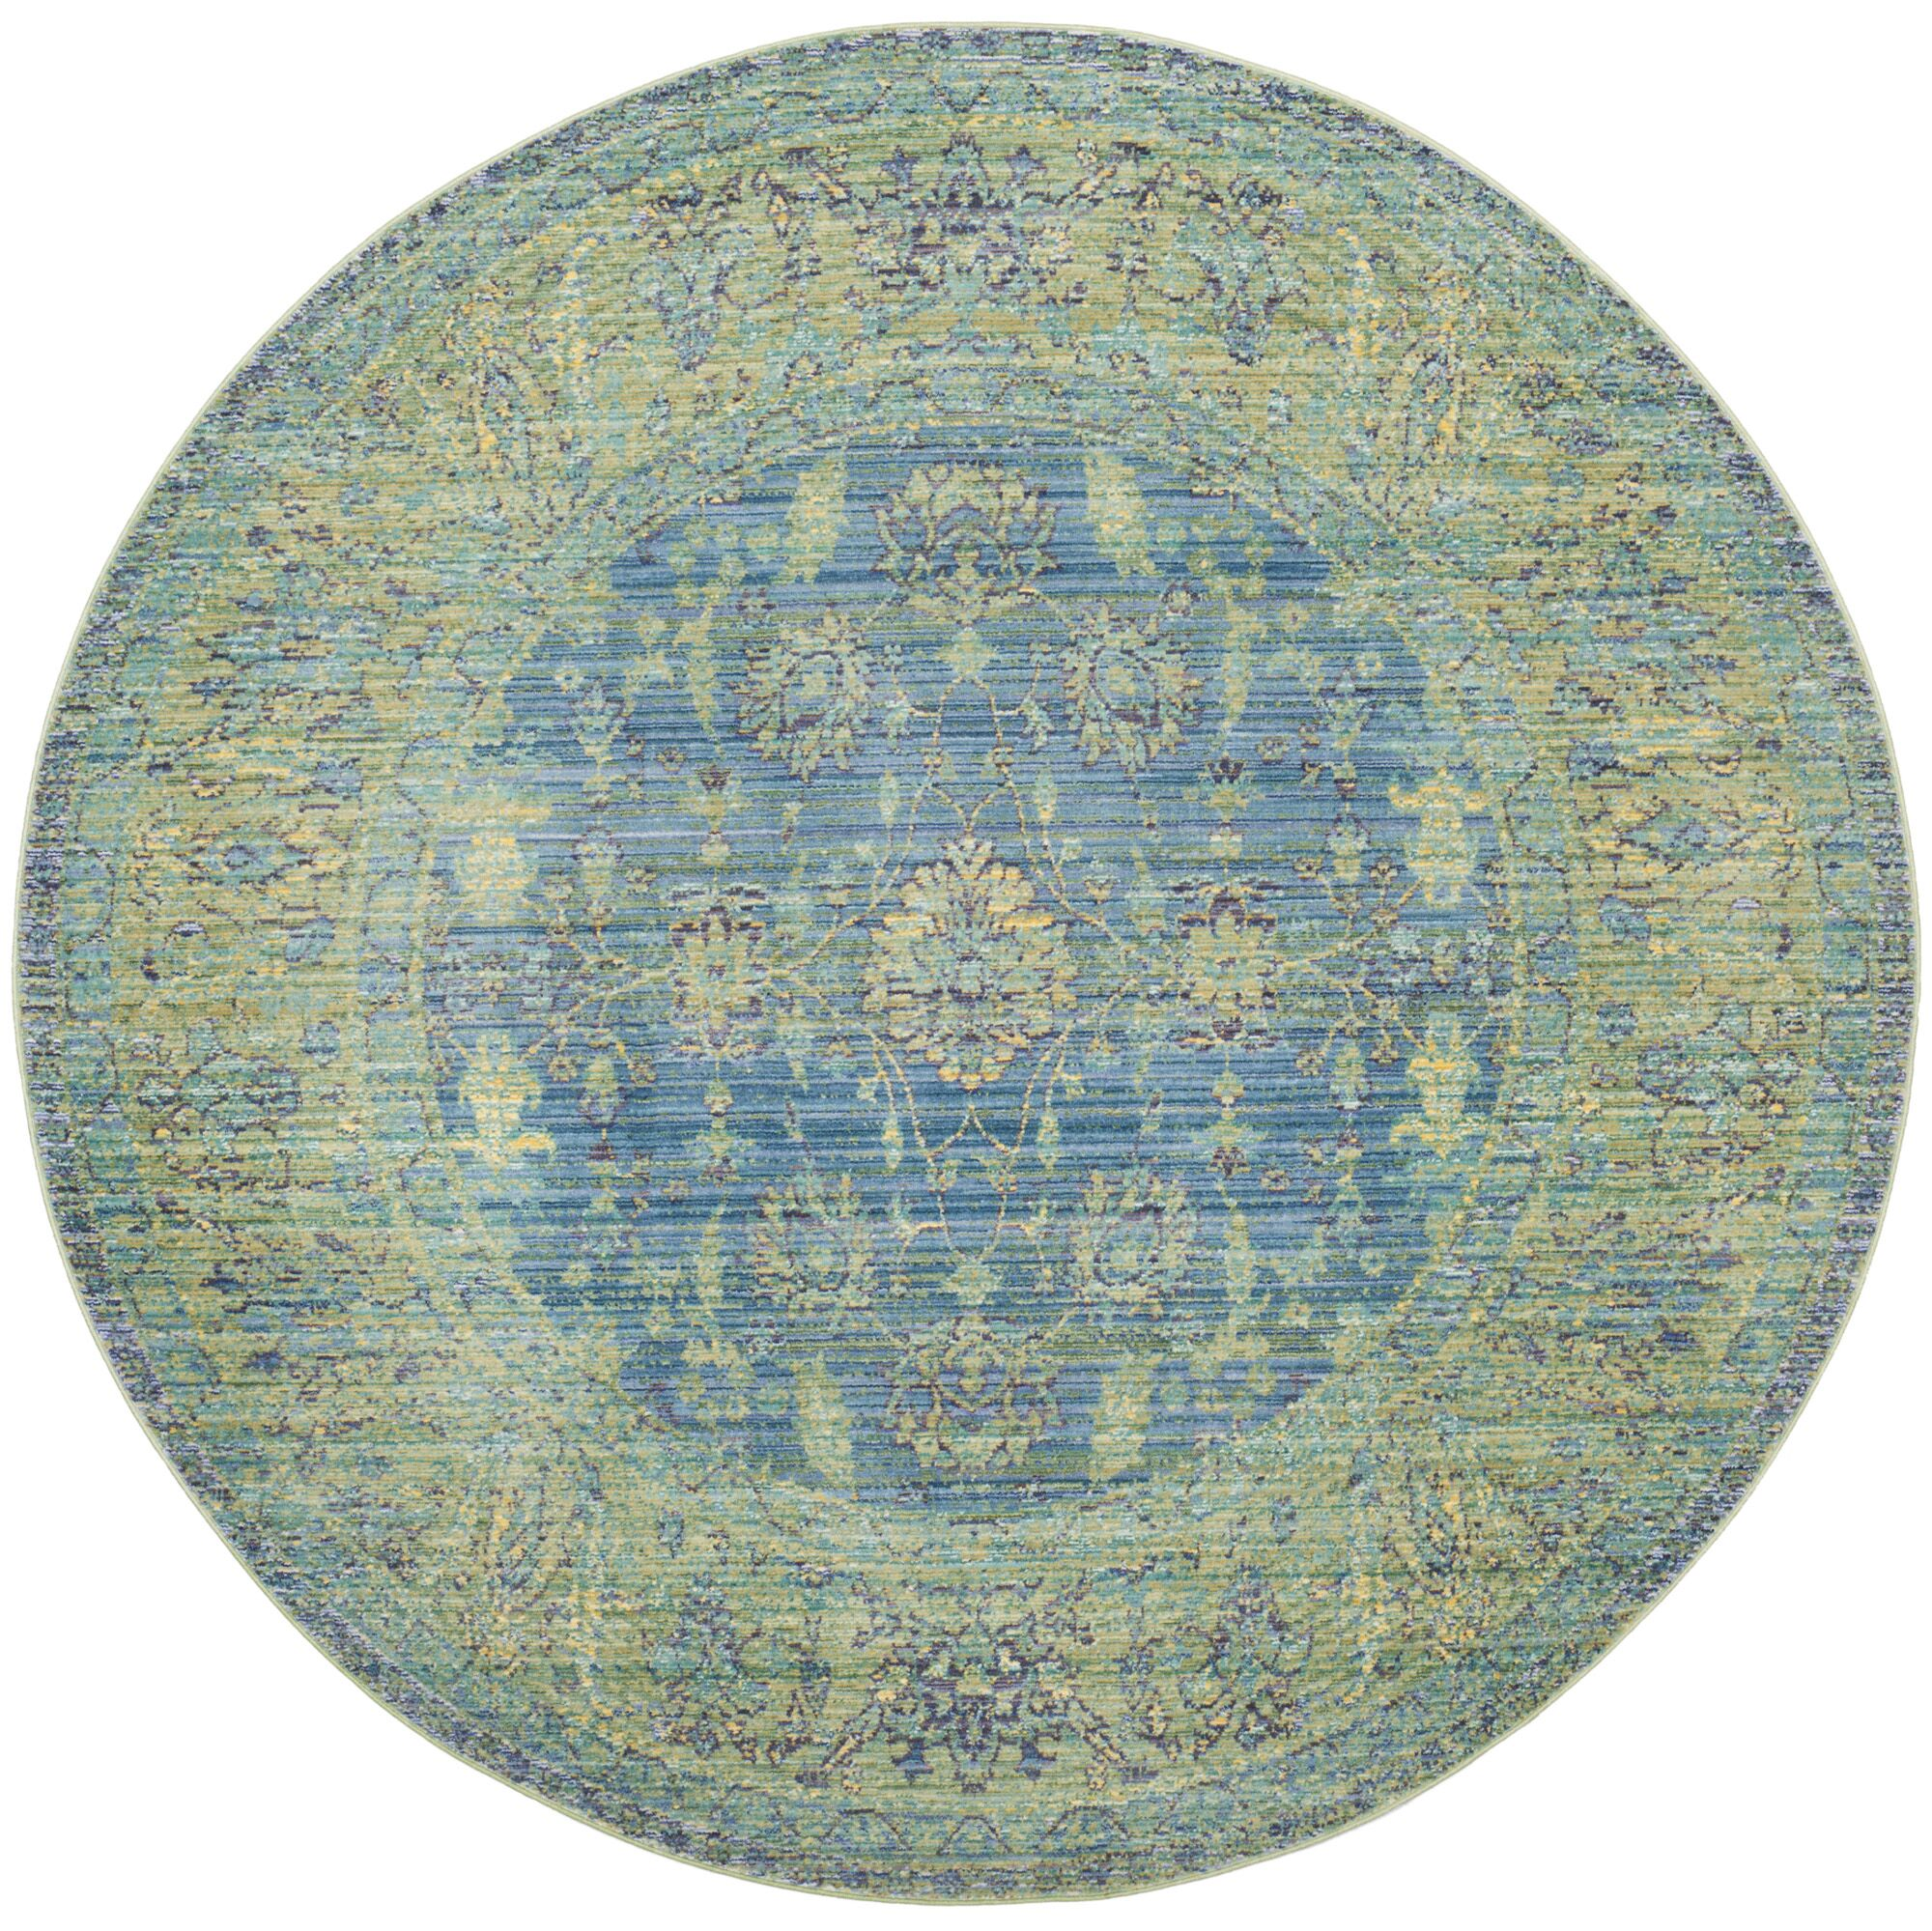 Doline Blue/Yellow Area Rug Rug Size: Round 6'7